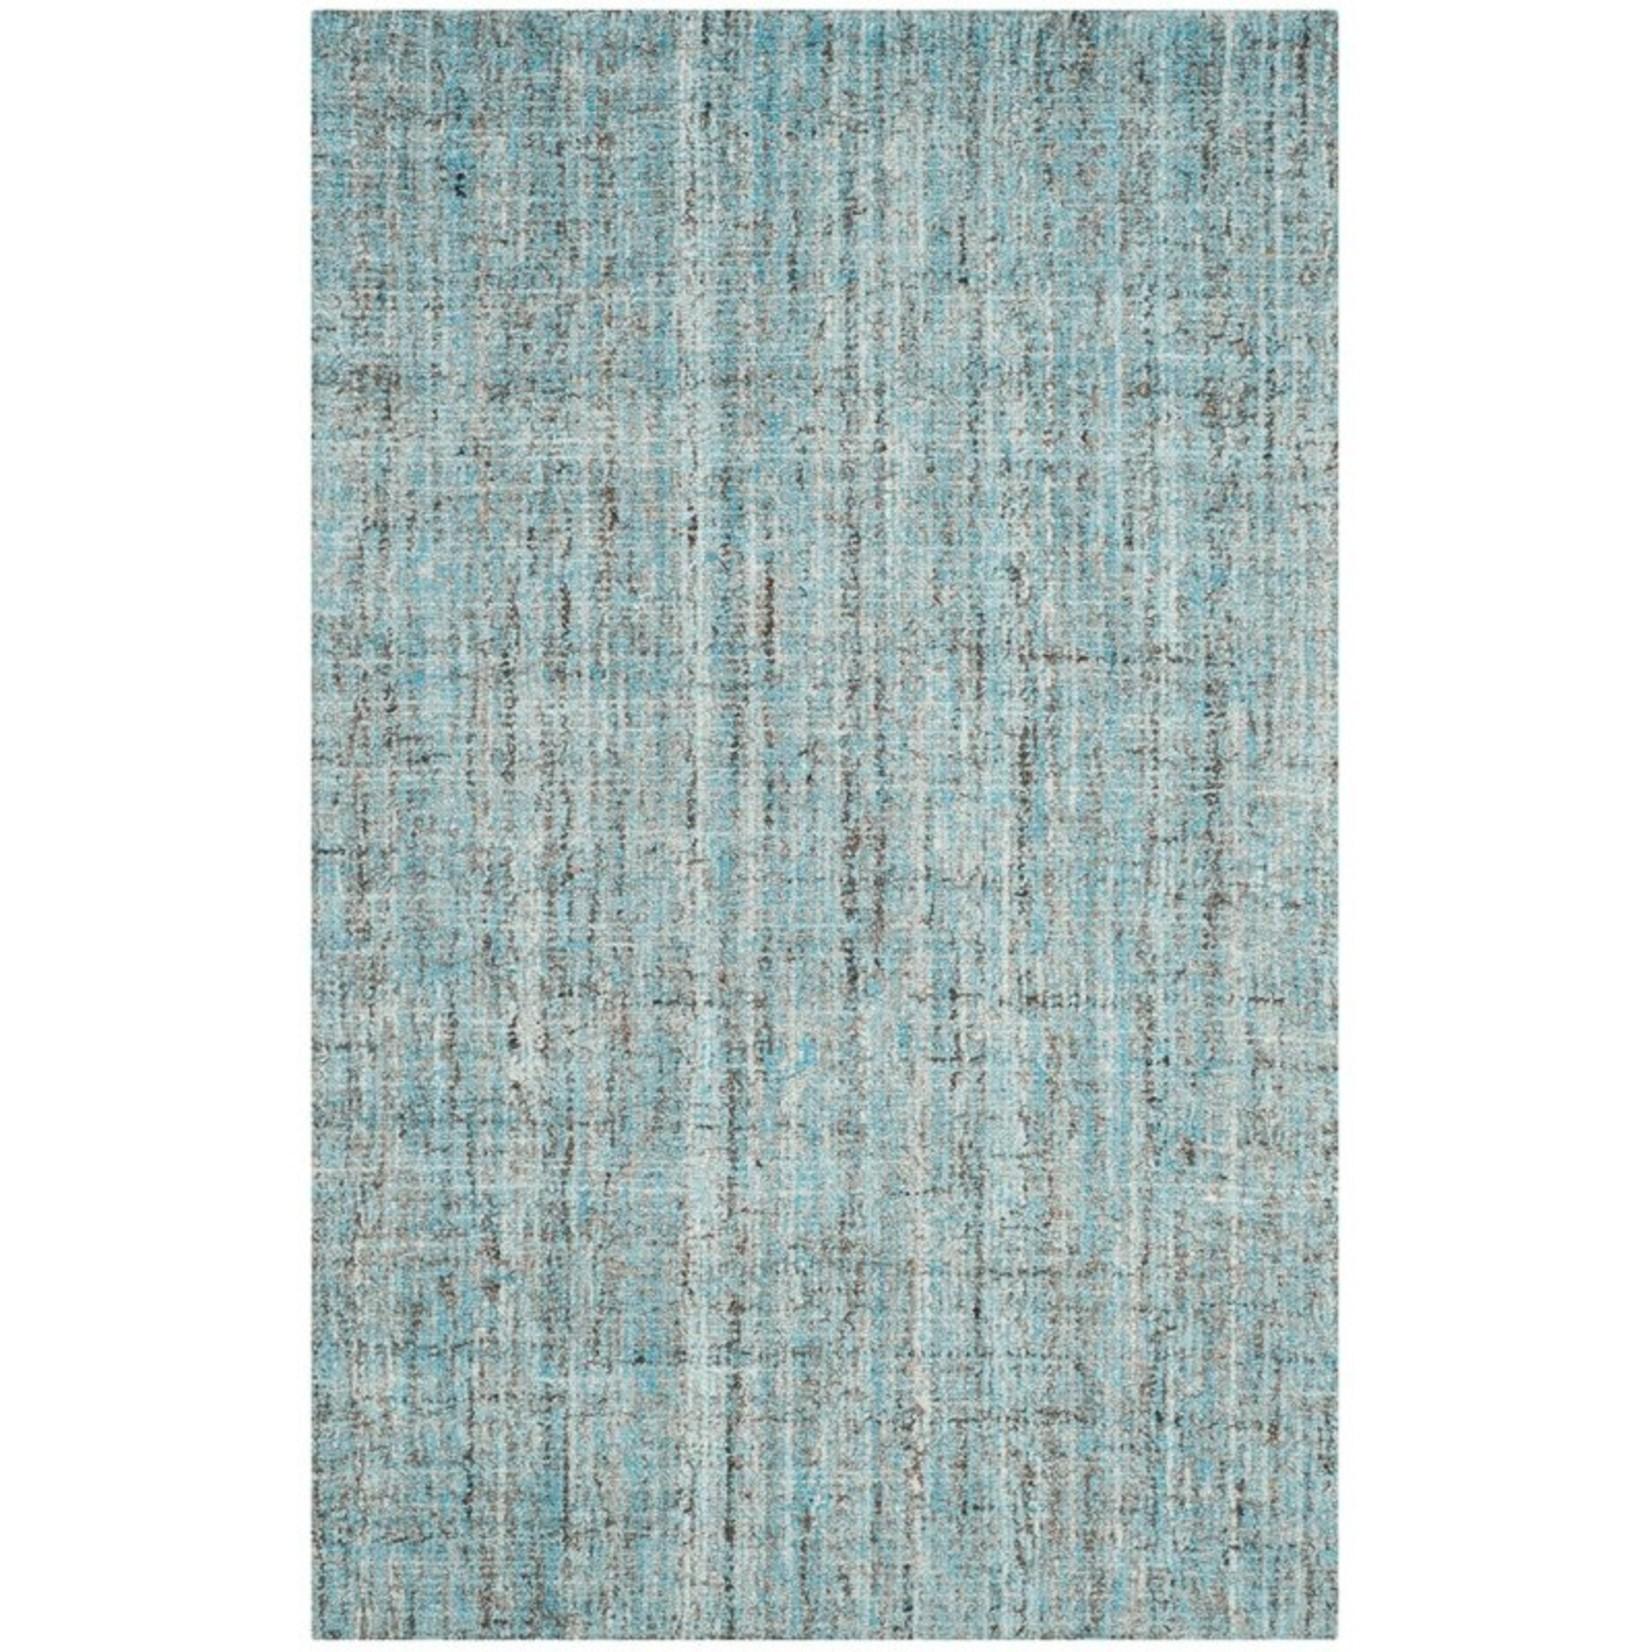 *3' x 5' - Dreshertown Blue Area Rug